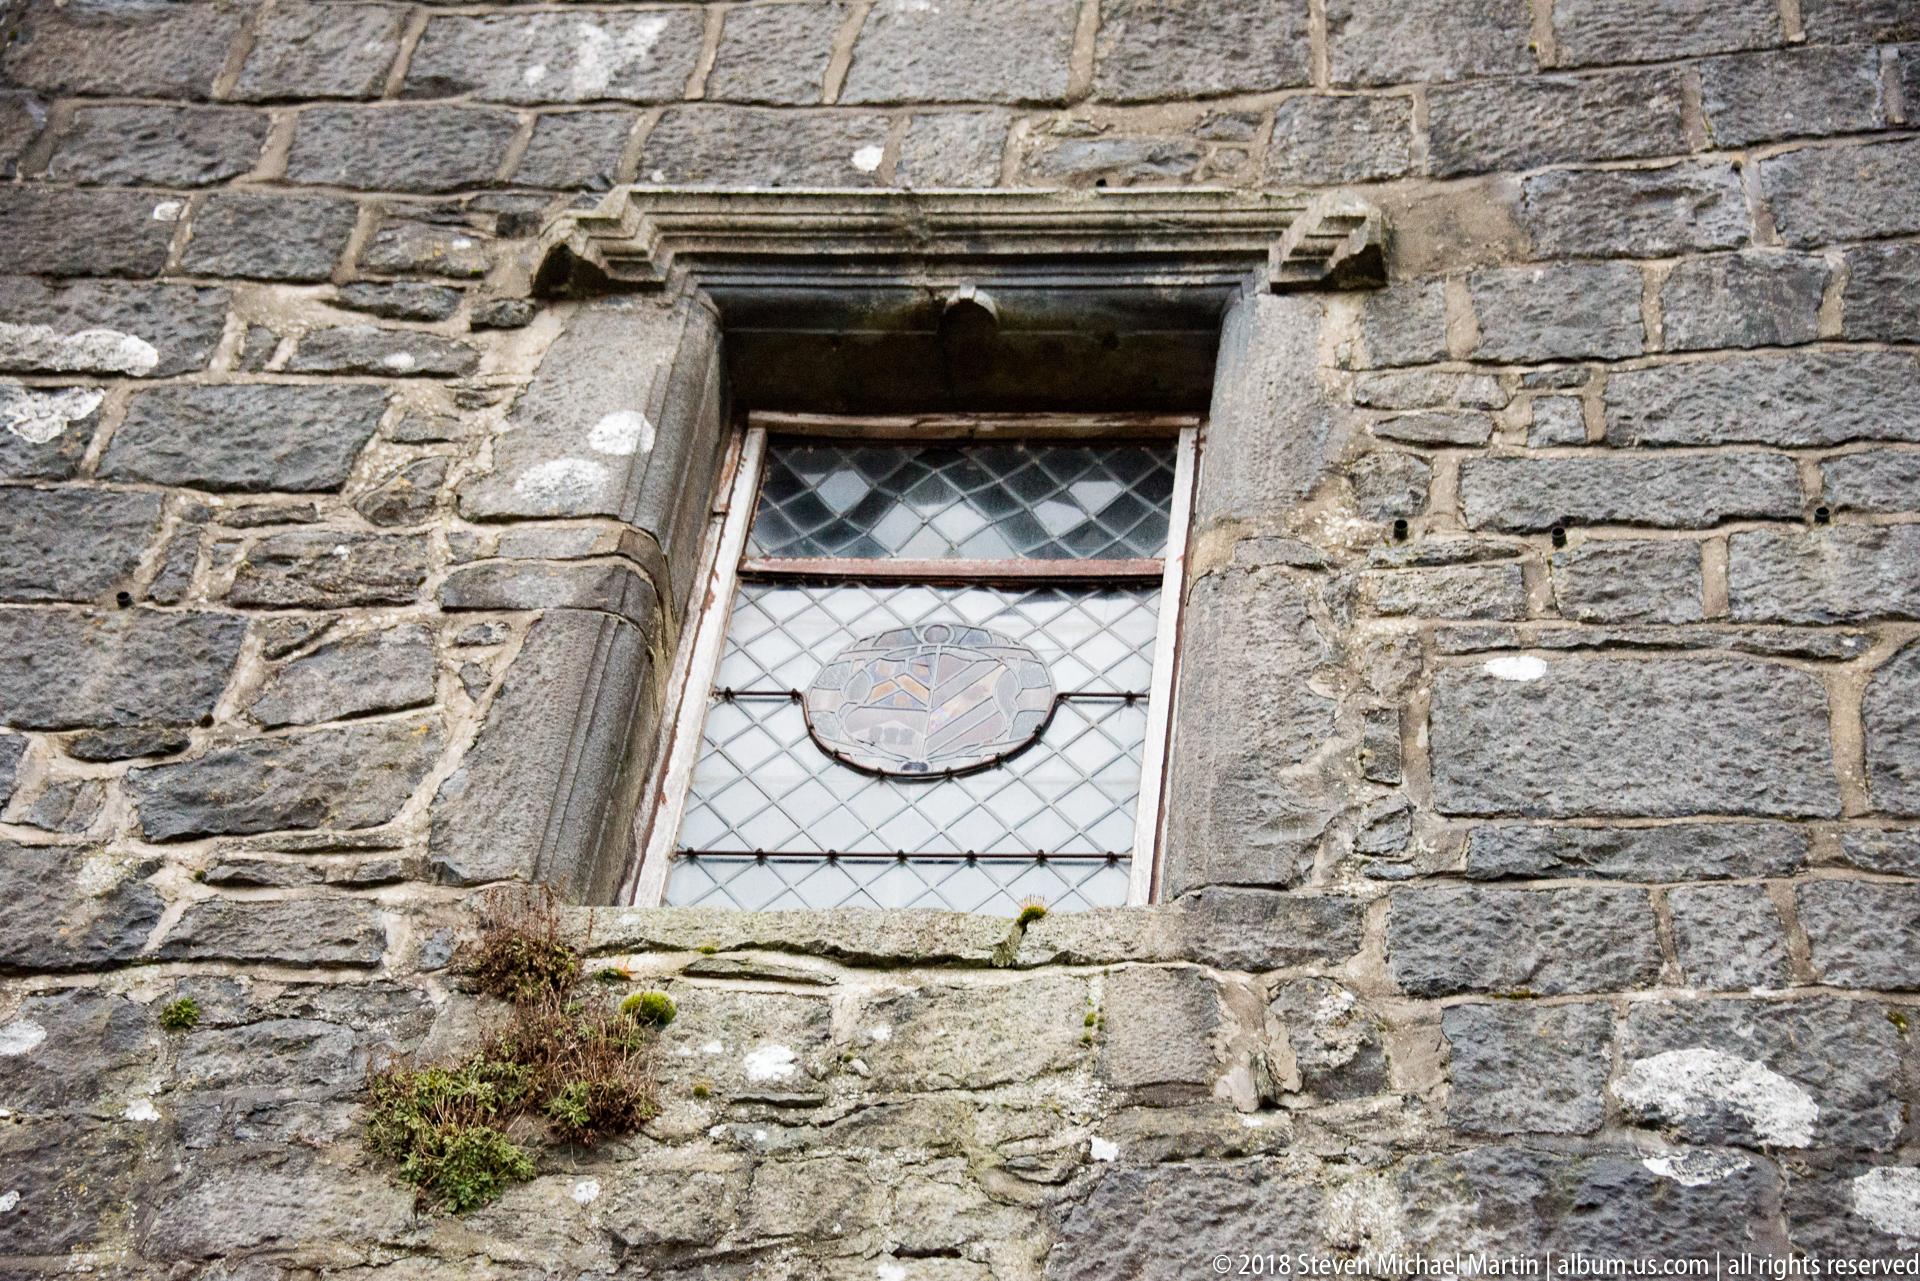 SMartin_2018 Ireland Donguaire Castle (10 of 28)